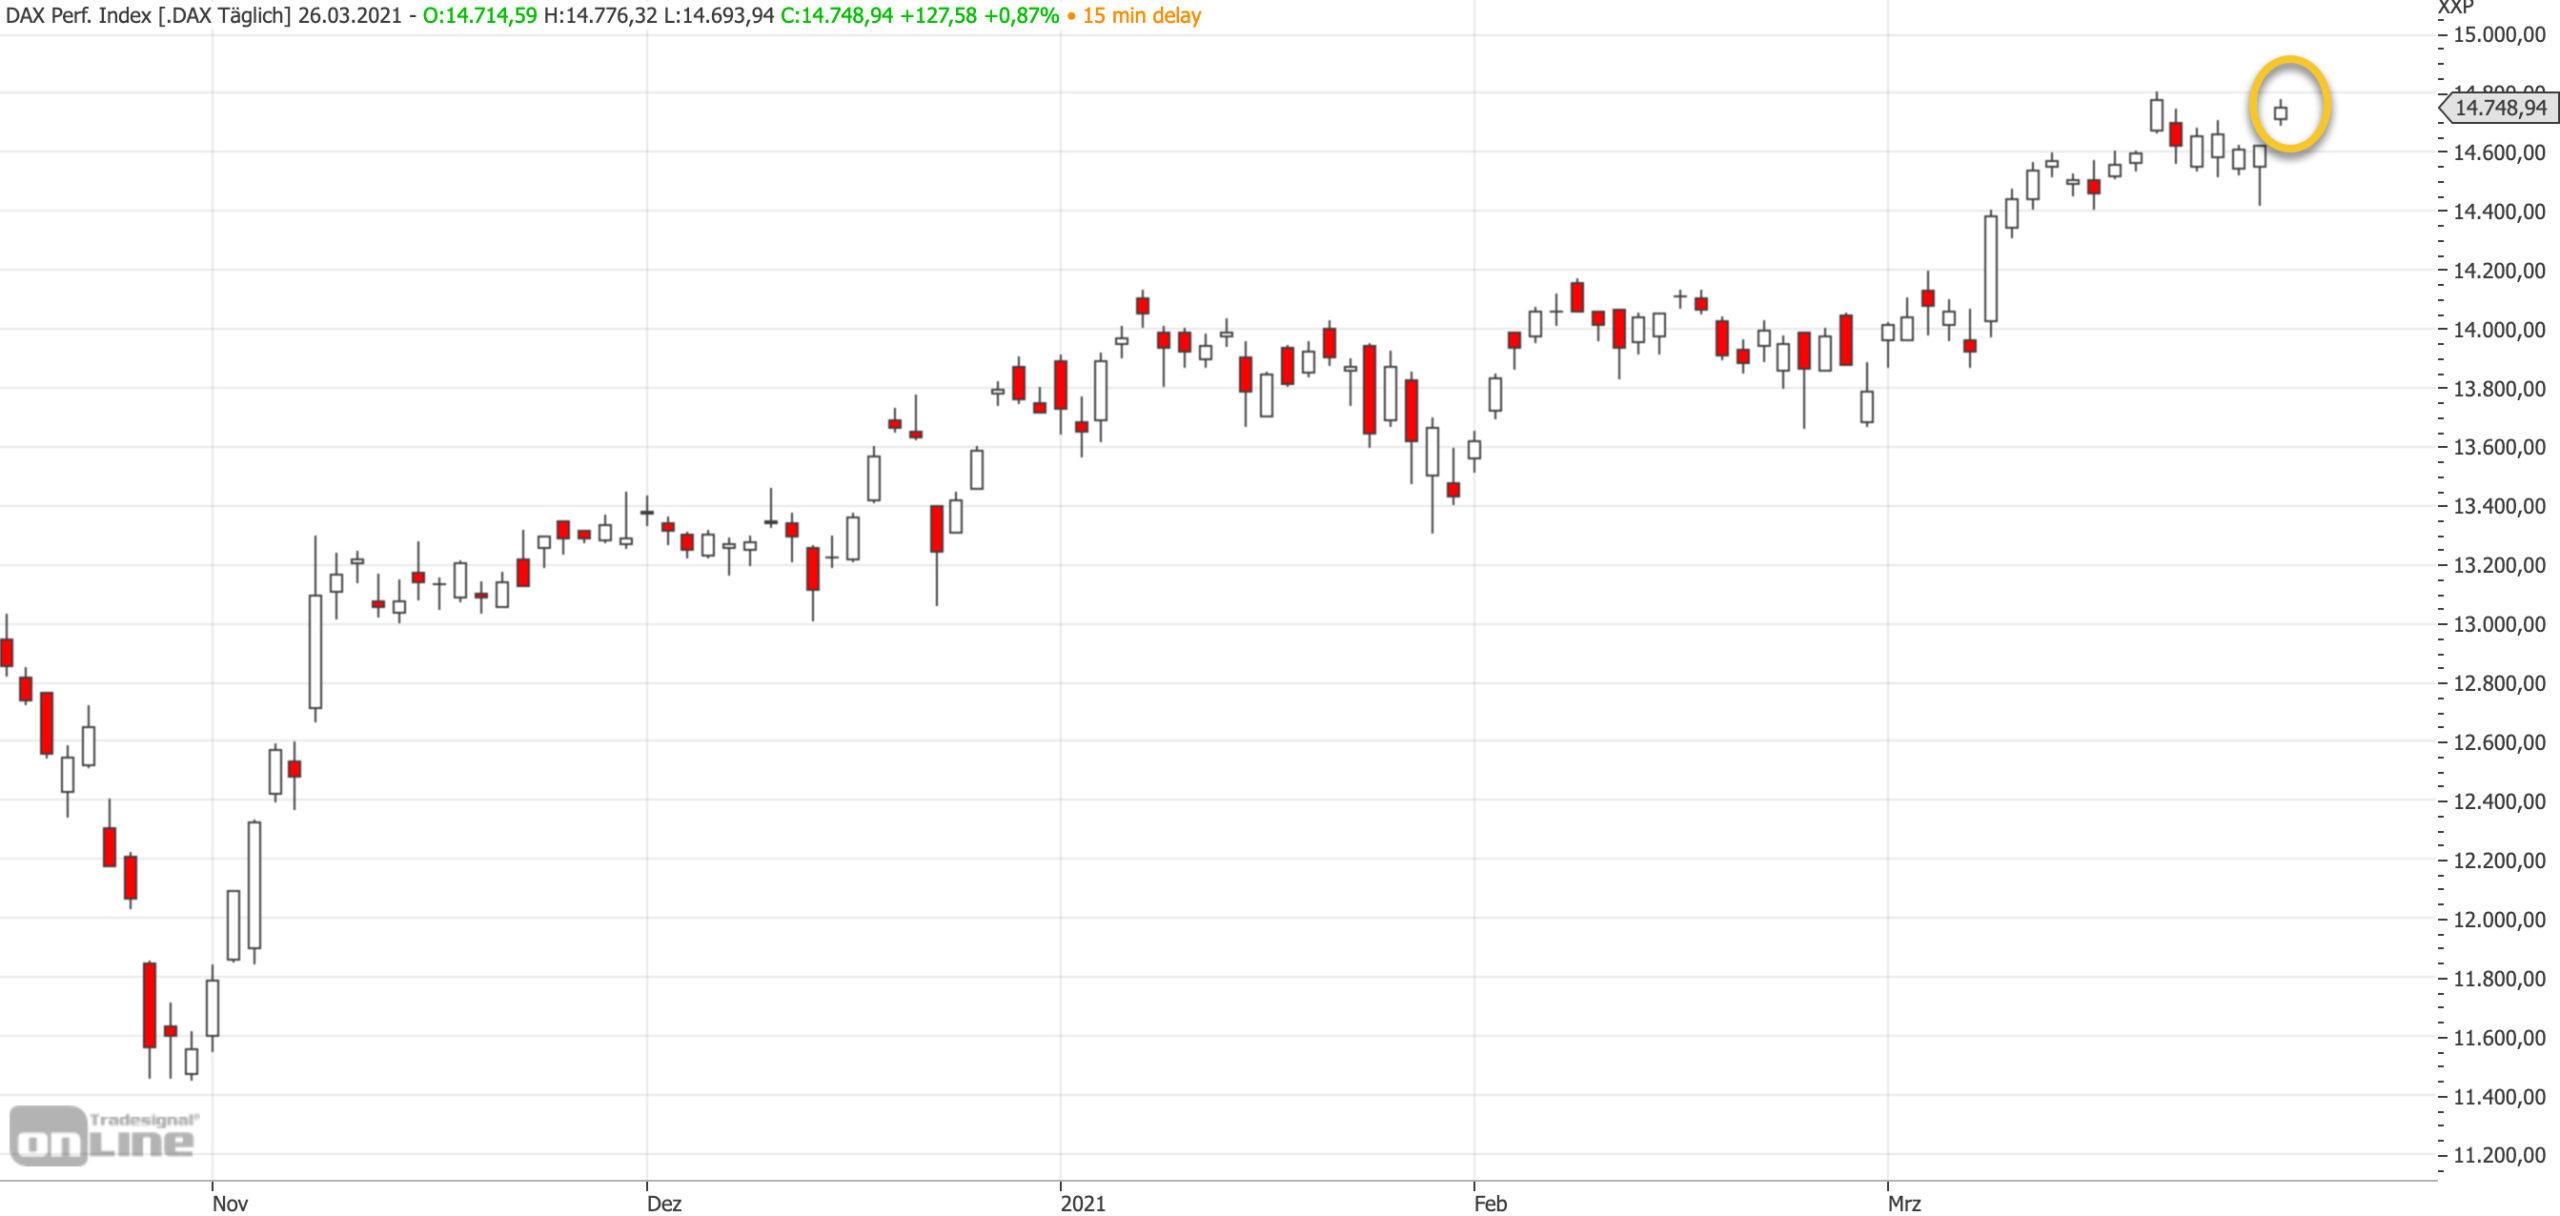 Mittelfristiger DAX-Chart am 26.03.2021